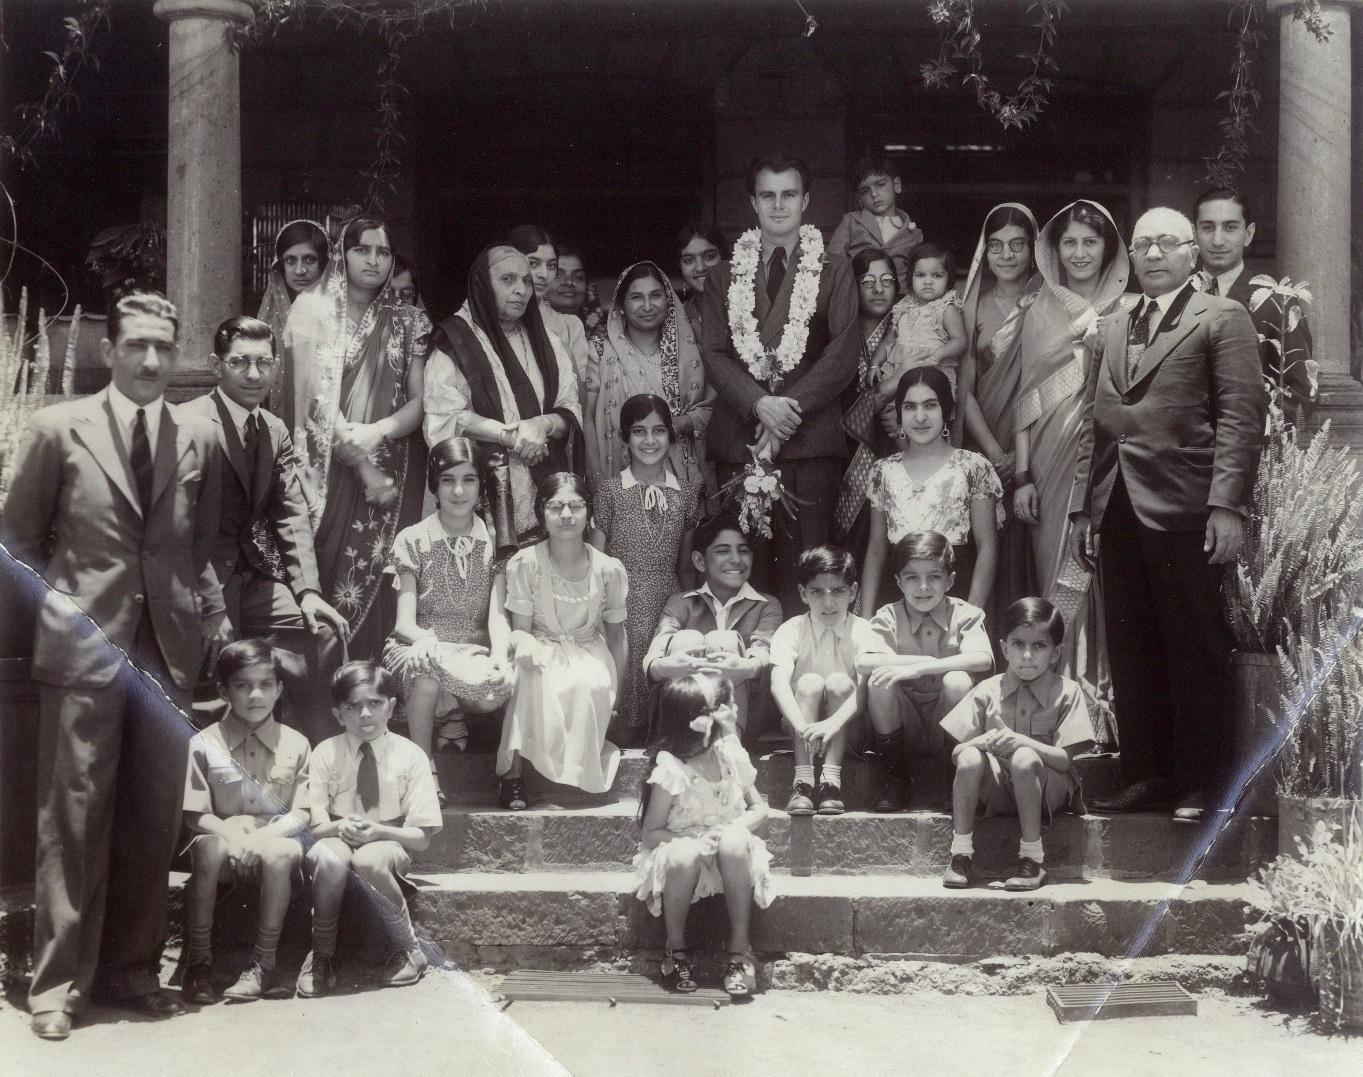 Aga Khan III Jan Karmali Collection 002, Prince Aly Khan Barakah